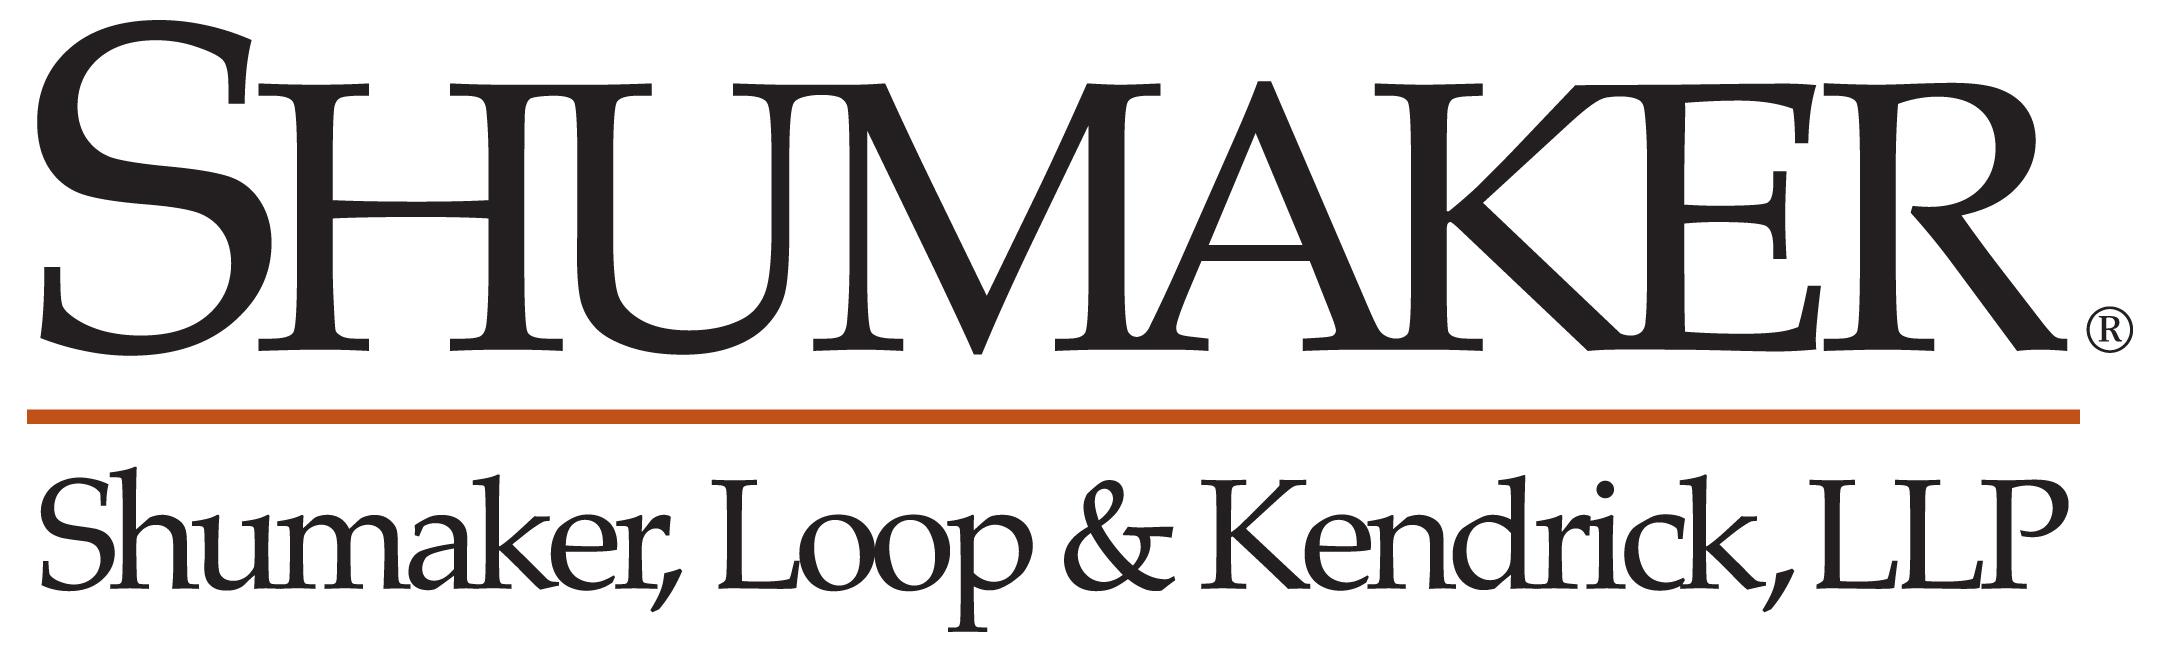 Shumaker, Loop & Kendrick, LLP